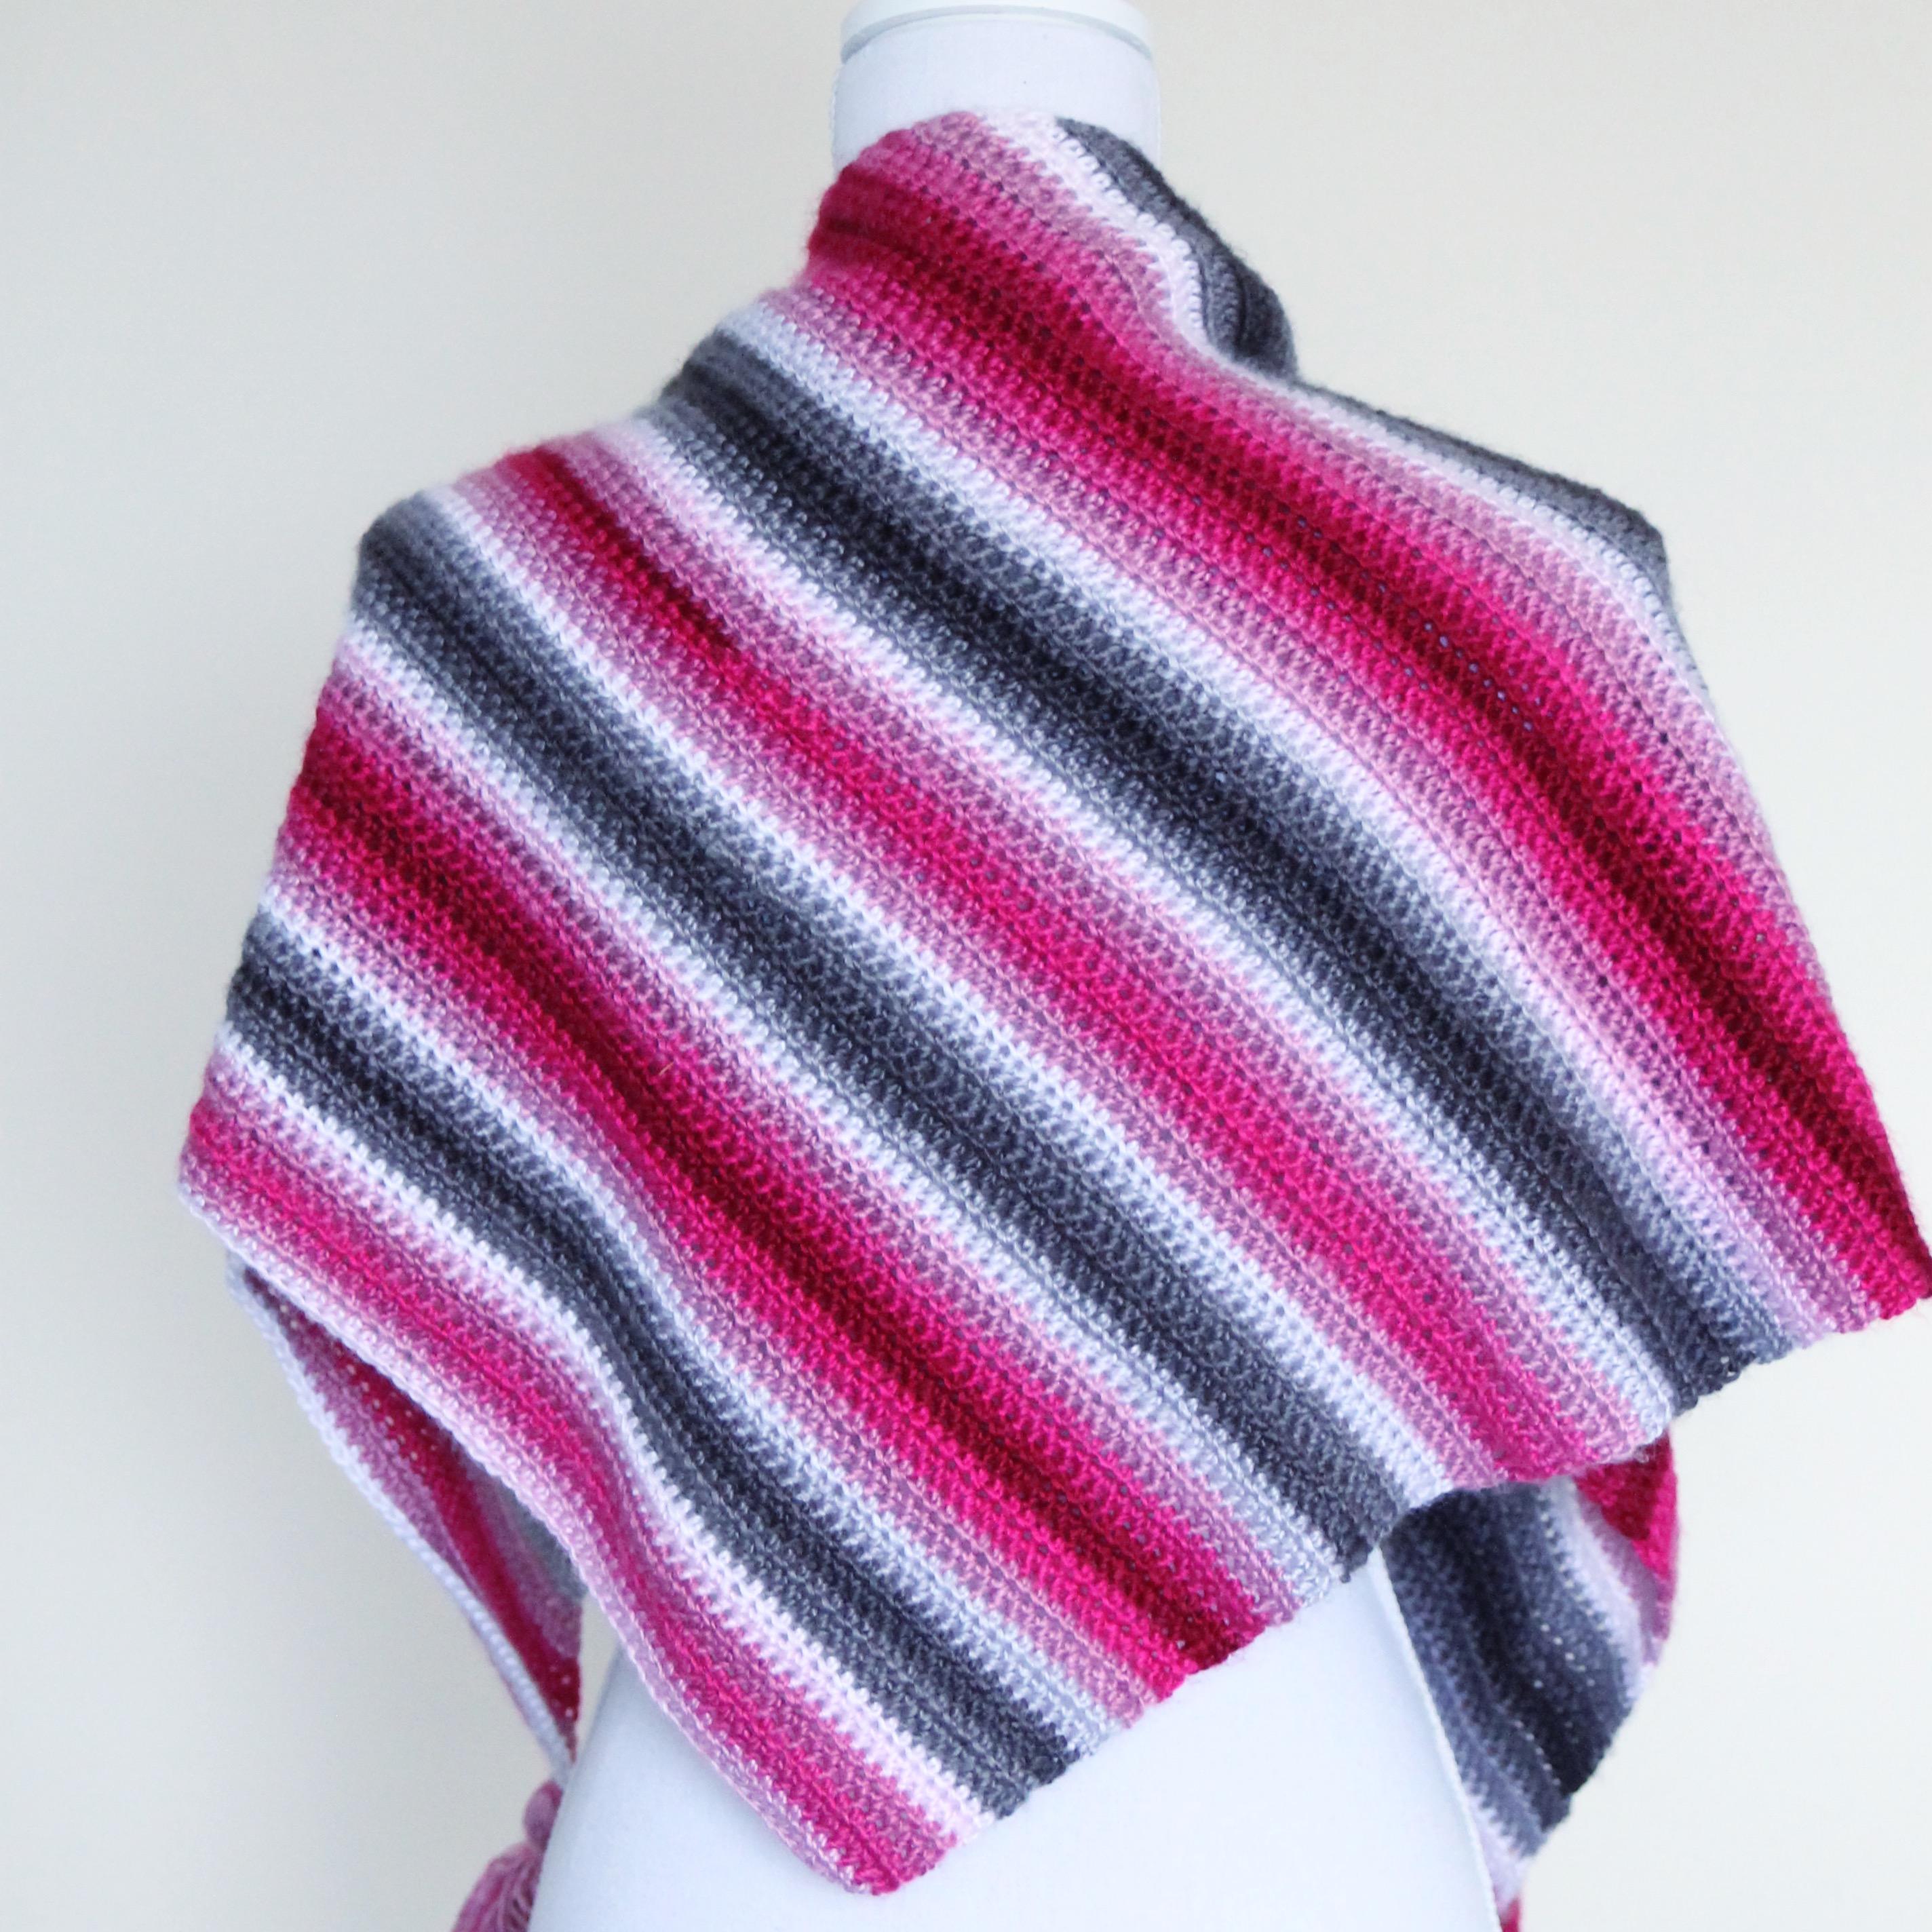 Cherry Blossom shawl, free crochet pattern